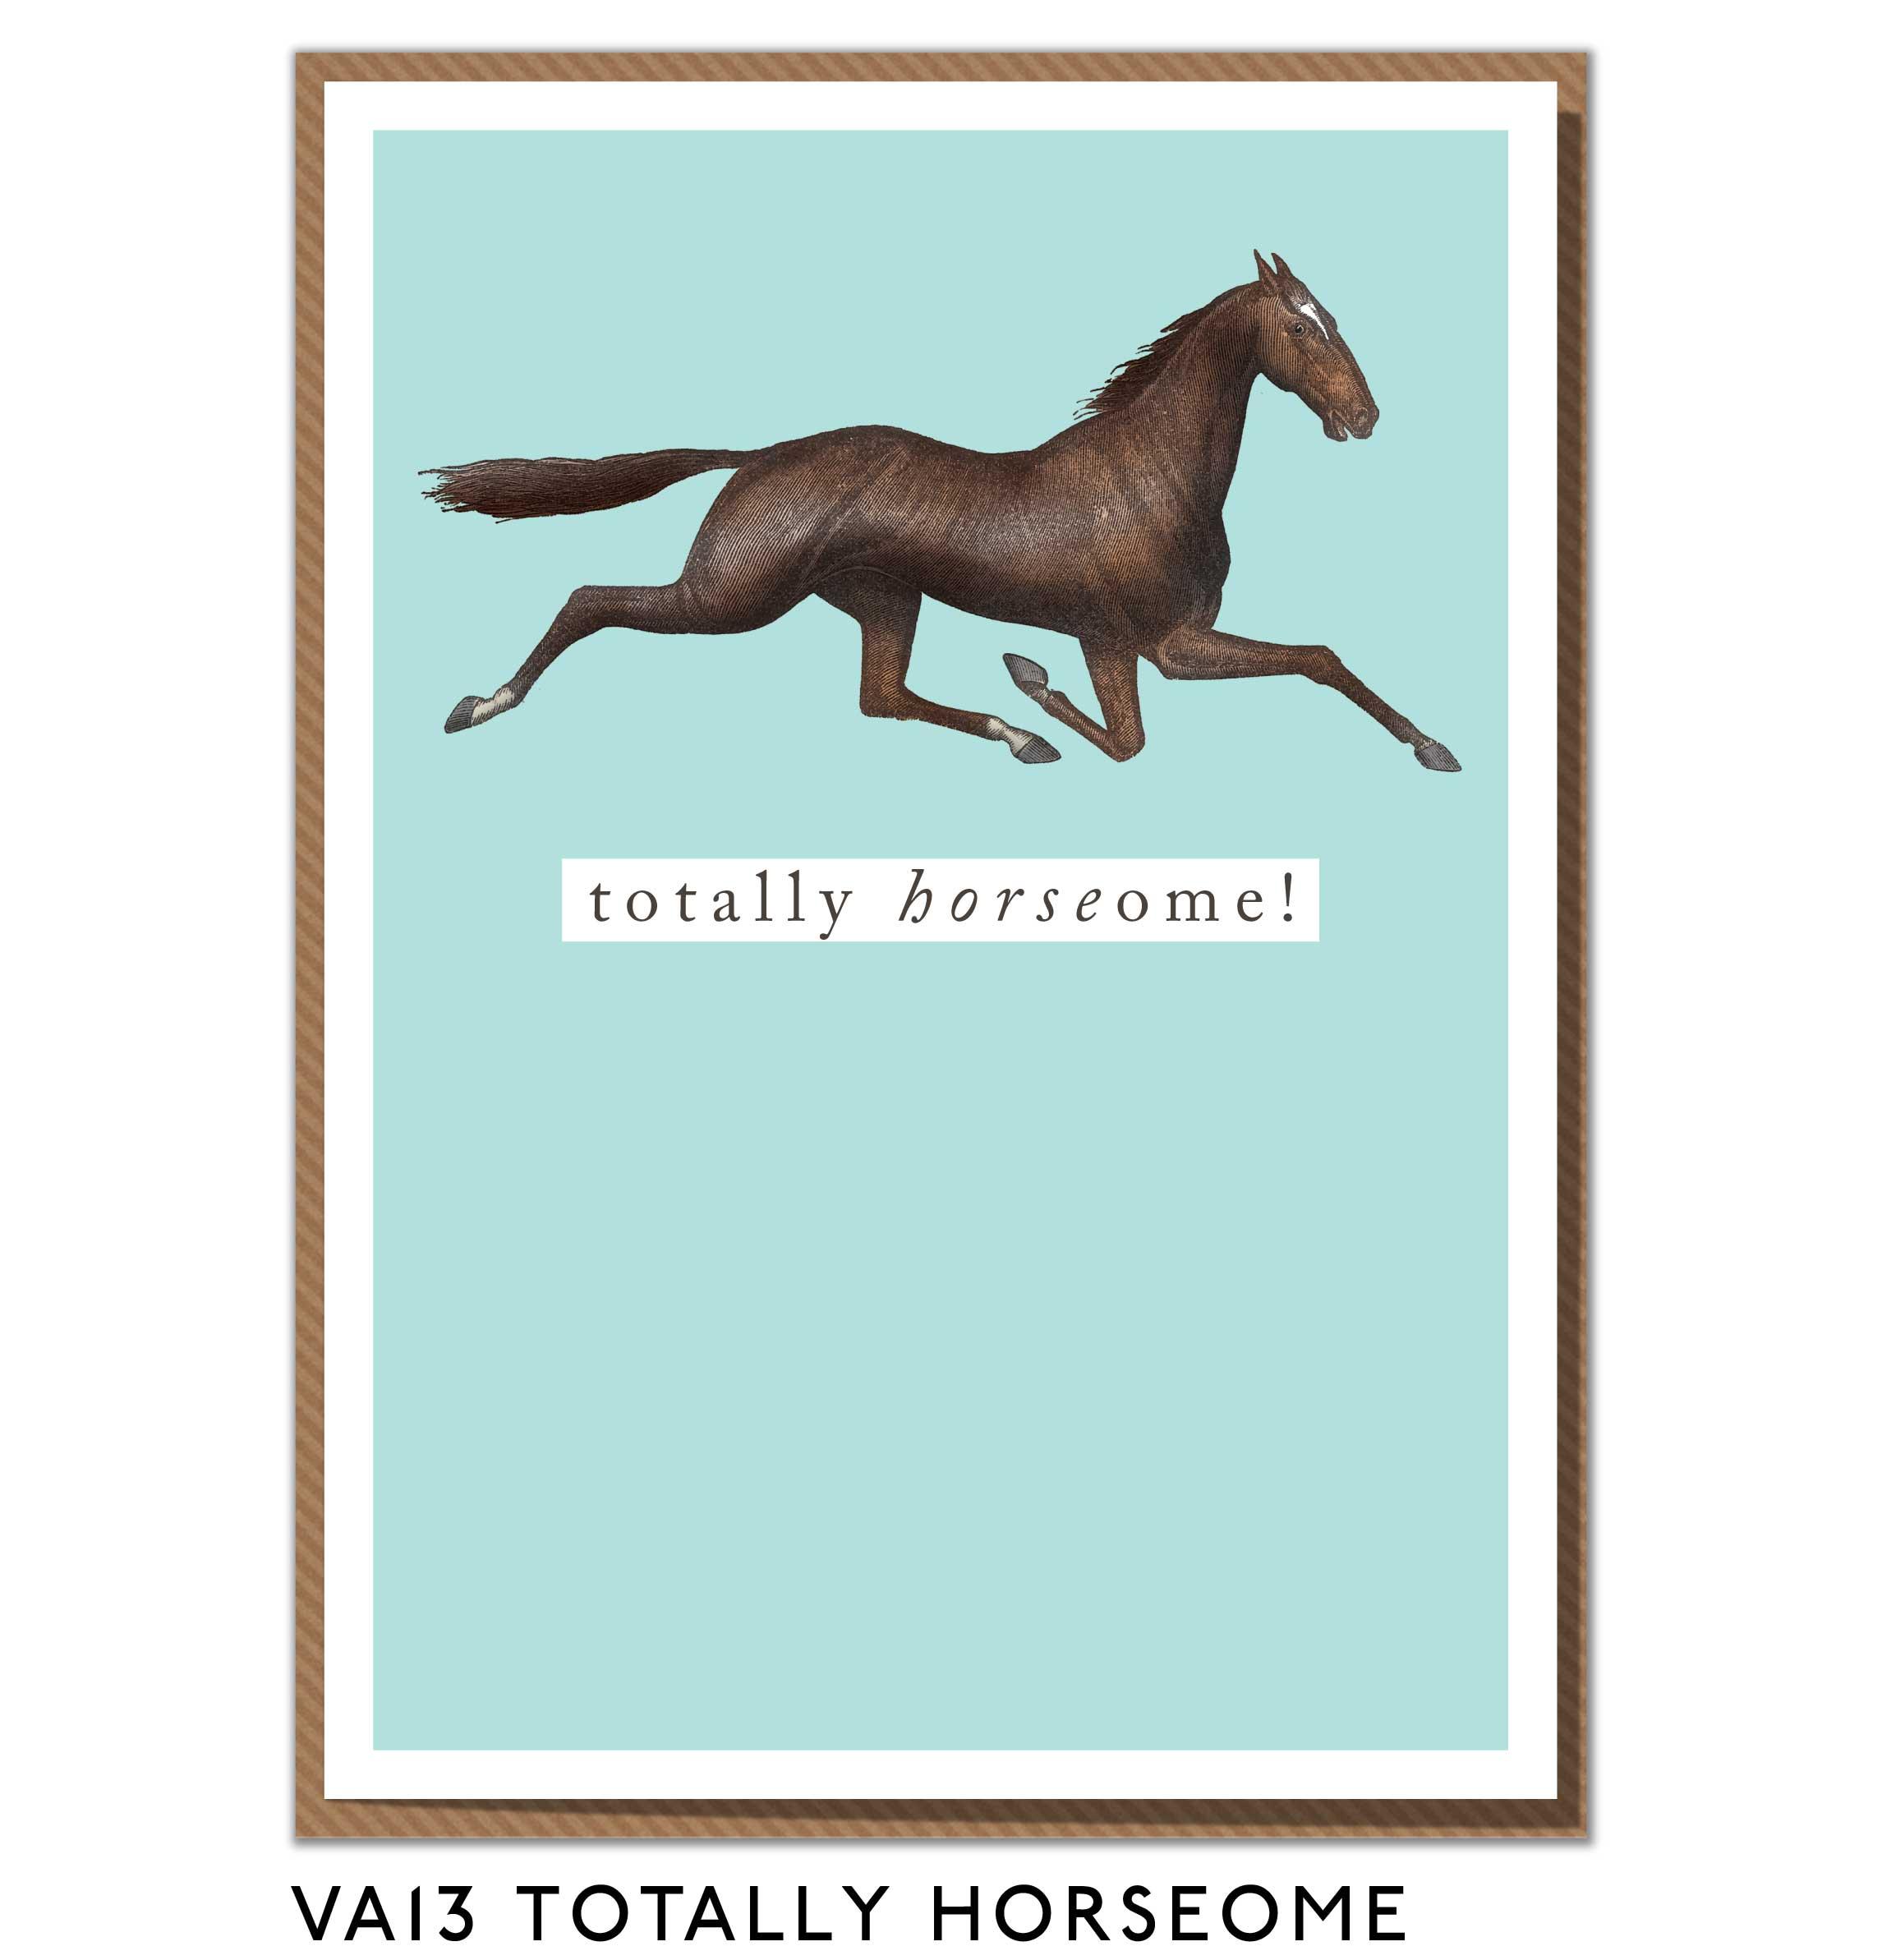 VA13-TOTALLY-HORSEOME.jpg